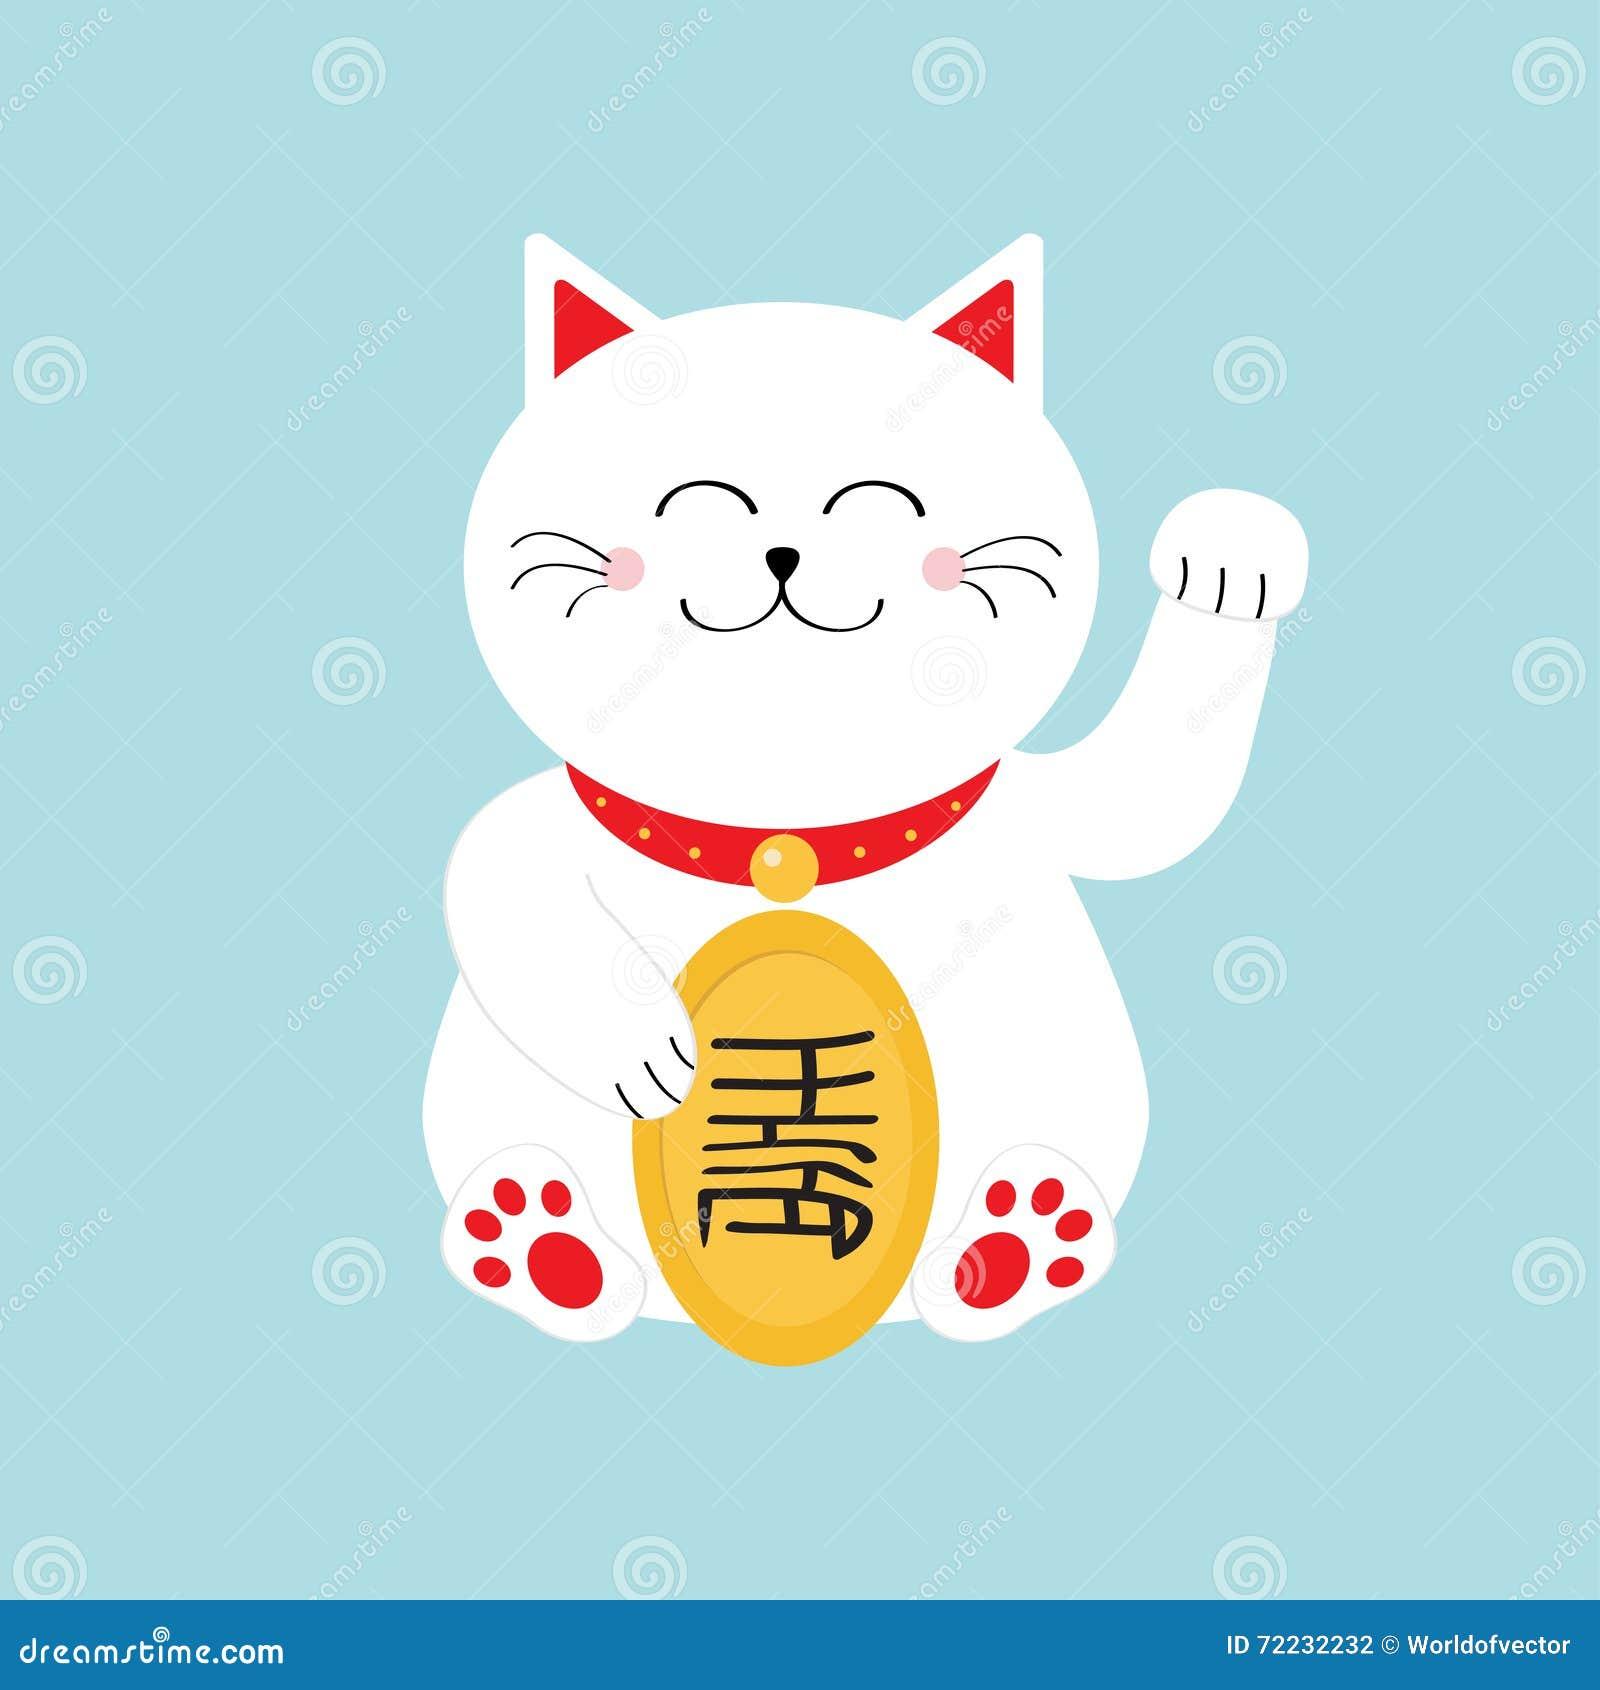 Lucky Cat Holding Golden Coin Japanese Maneki Neco Cat Waving Hand Paw Icon Feng Shui Success Wealth Symbol Mascot Cute Cartoon Stock Vector Illustration Of Animal Flat 72232232